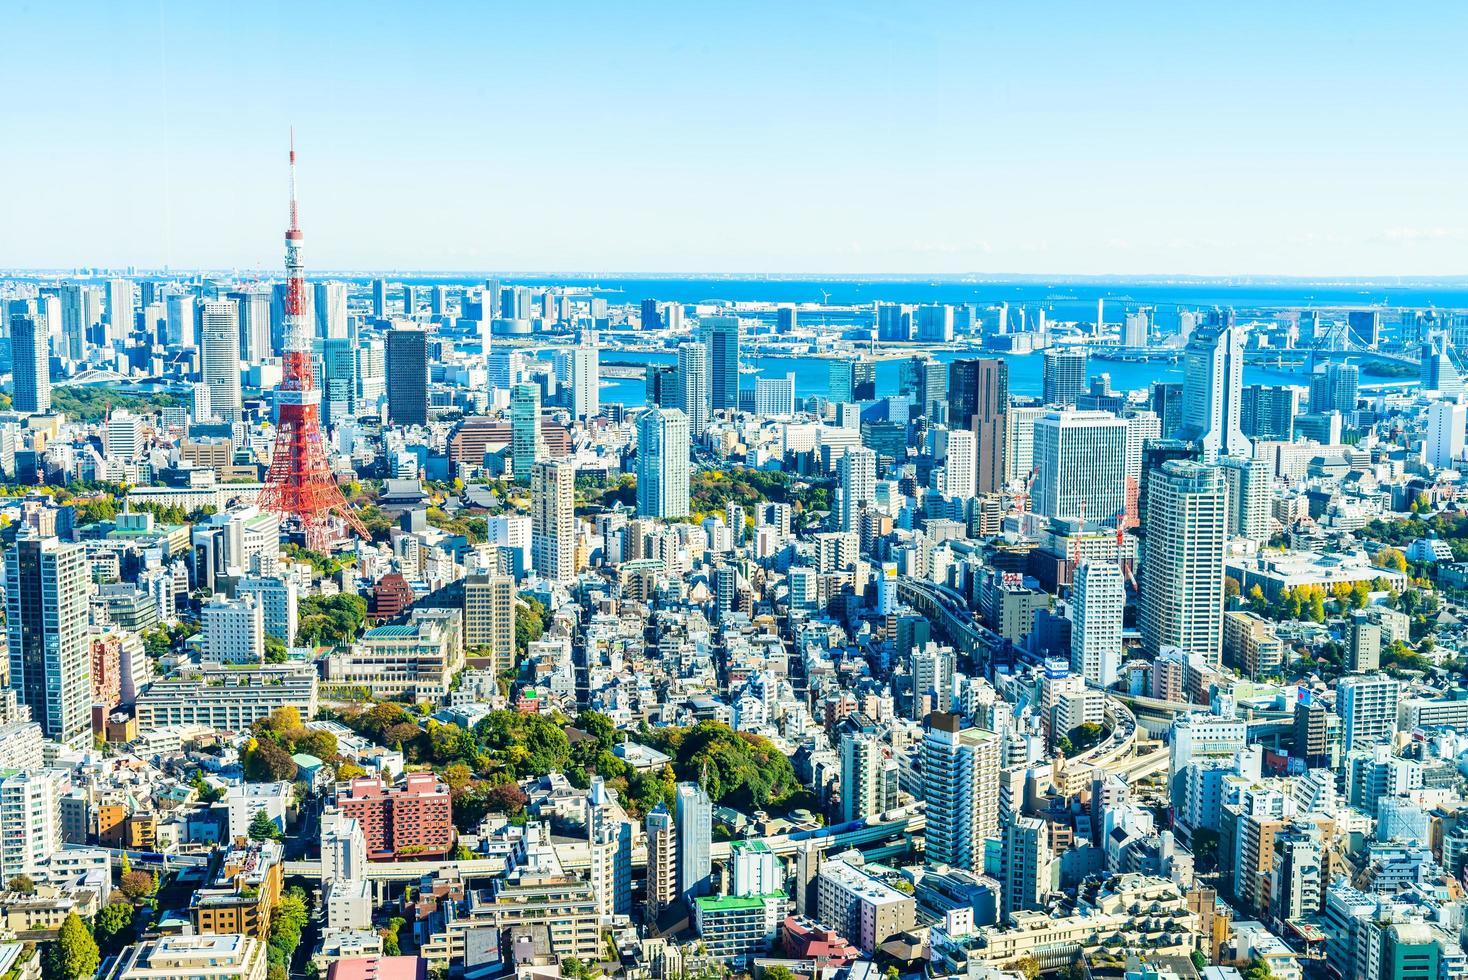 paisaje urbano de tokio en japón foto